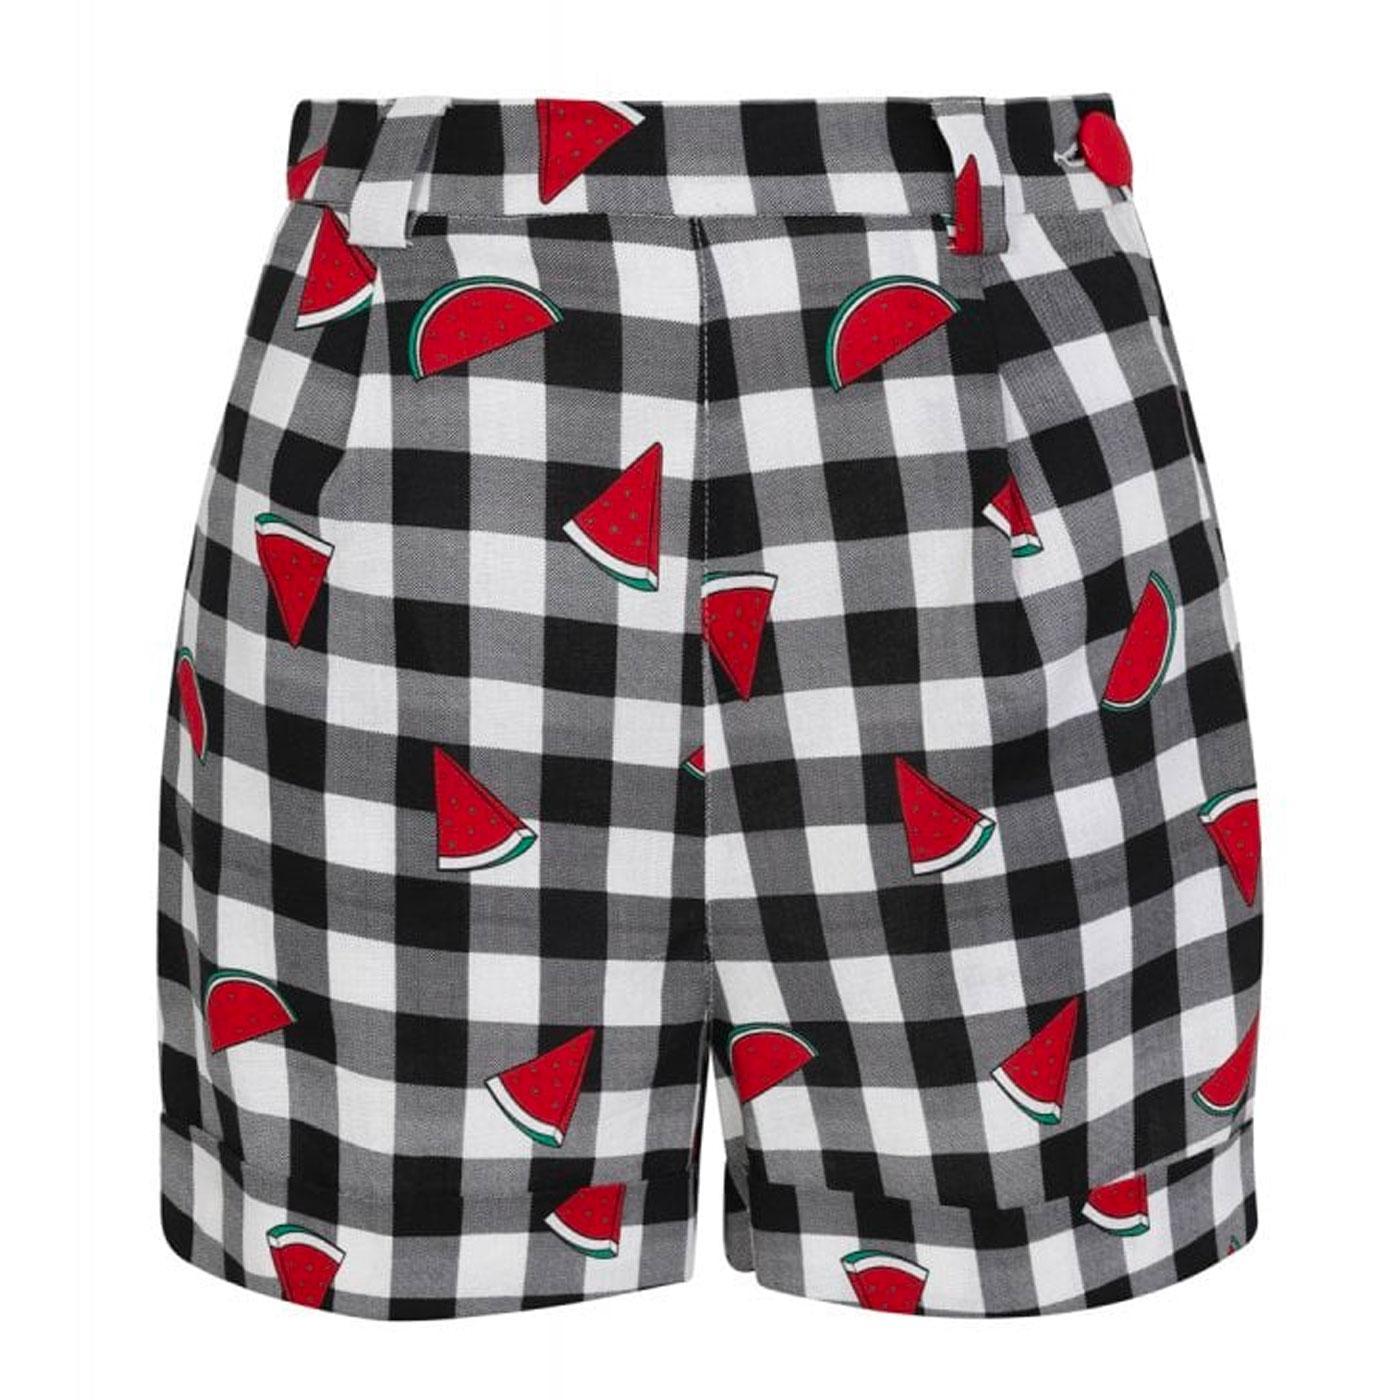 Jojo COLLECTIF Watermelon Print Gingham Shorts B/W